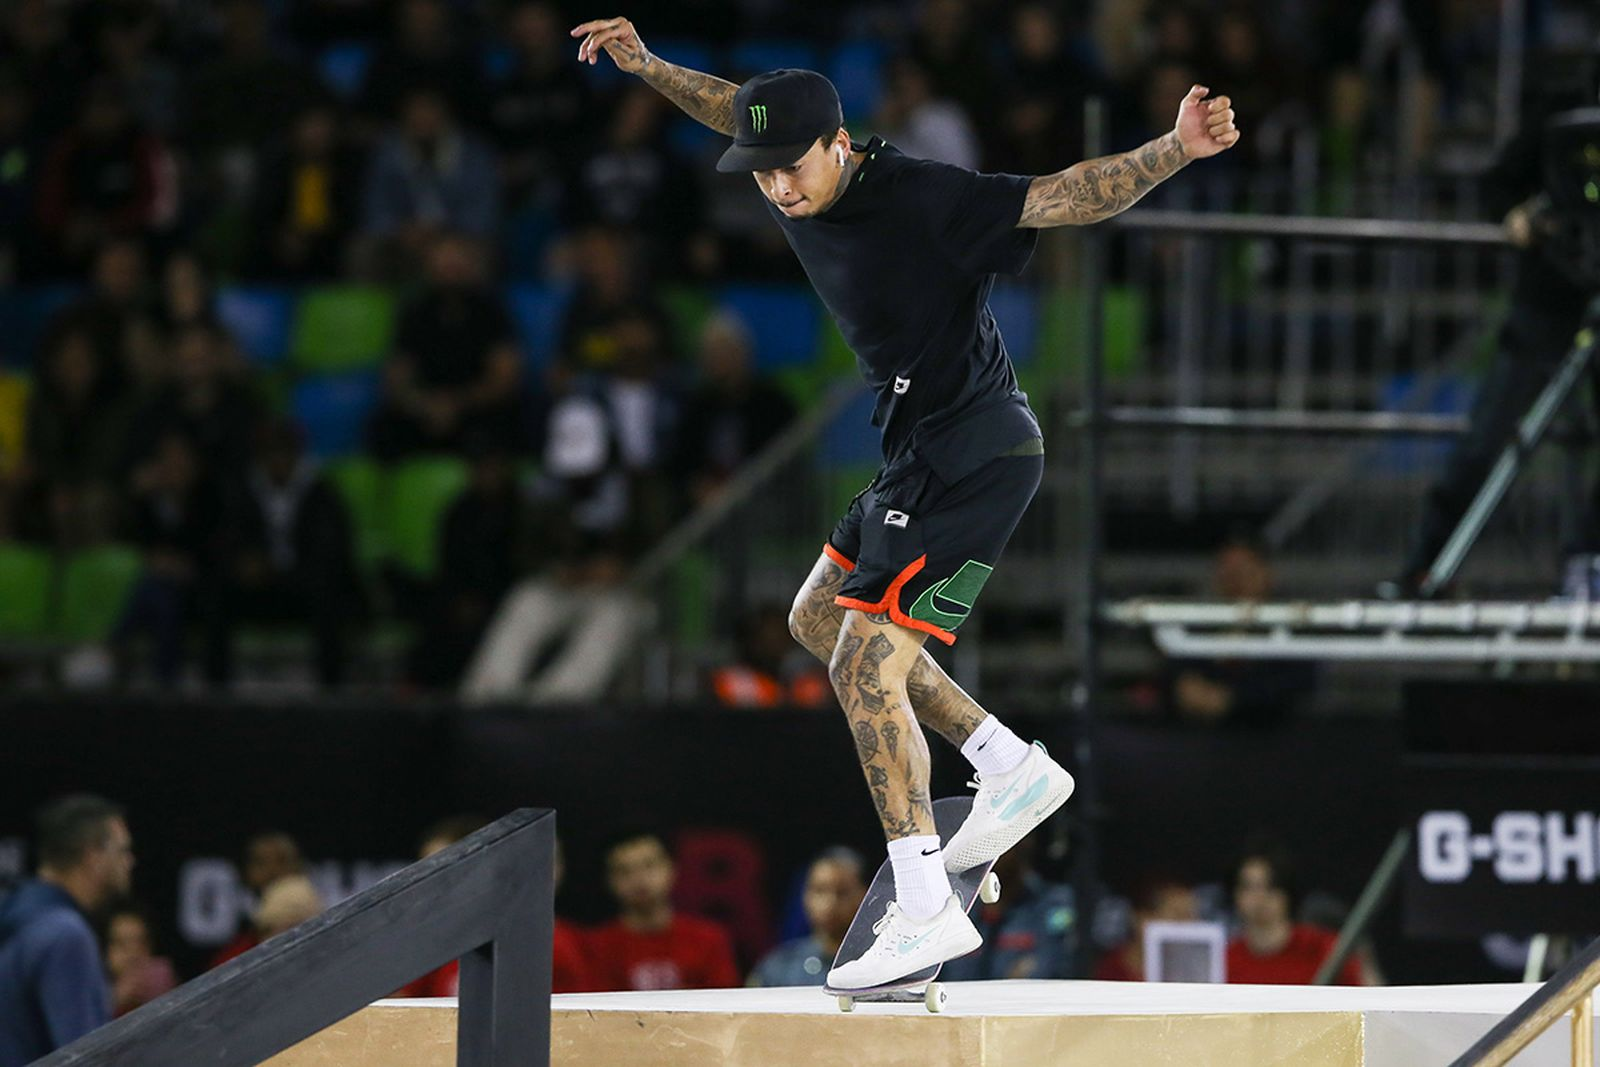 Nyjah Huston skateboarding